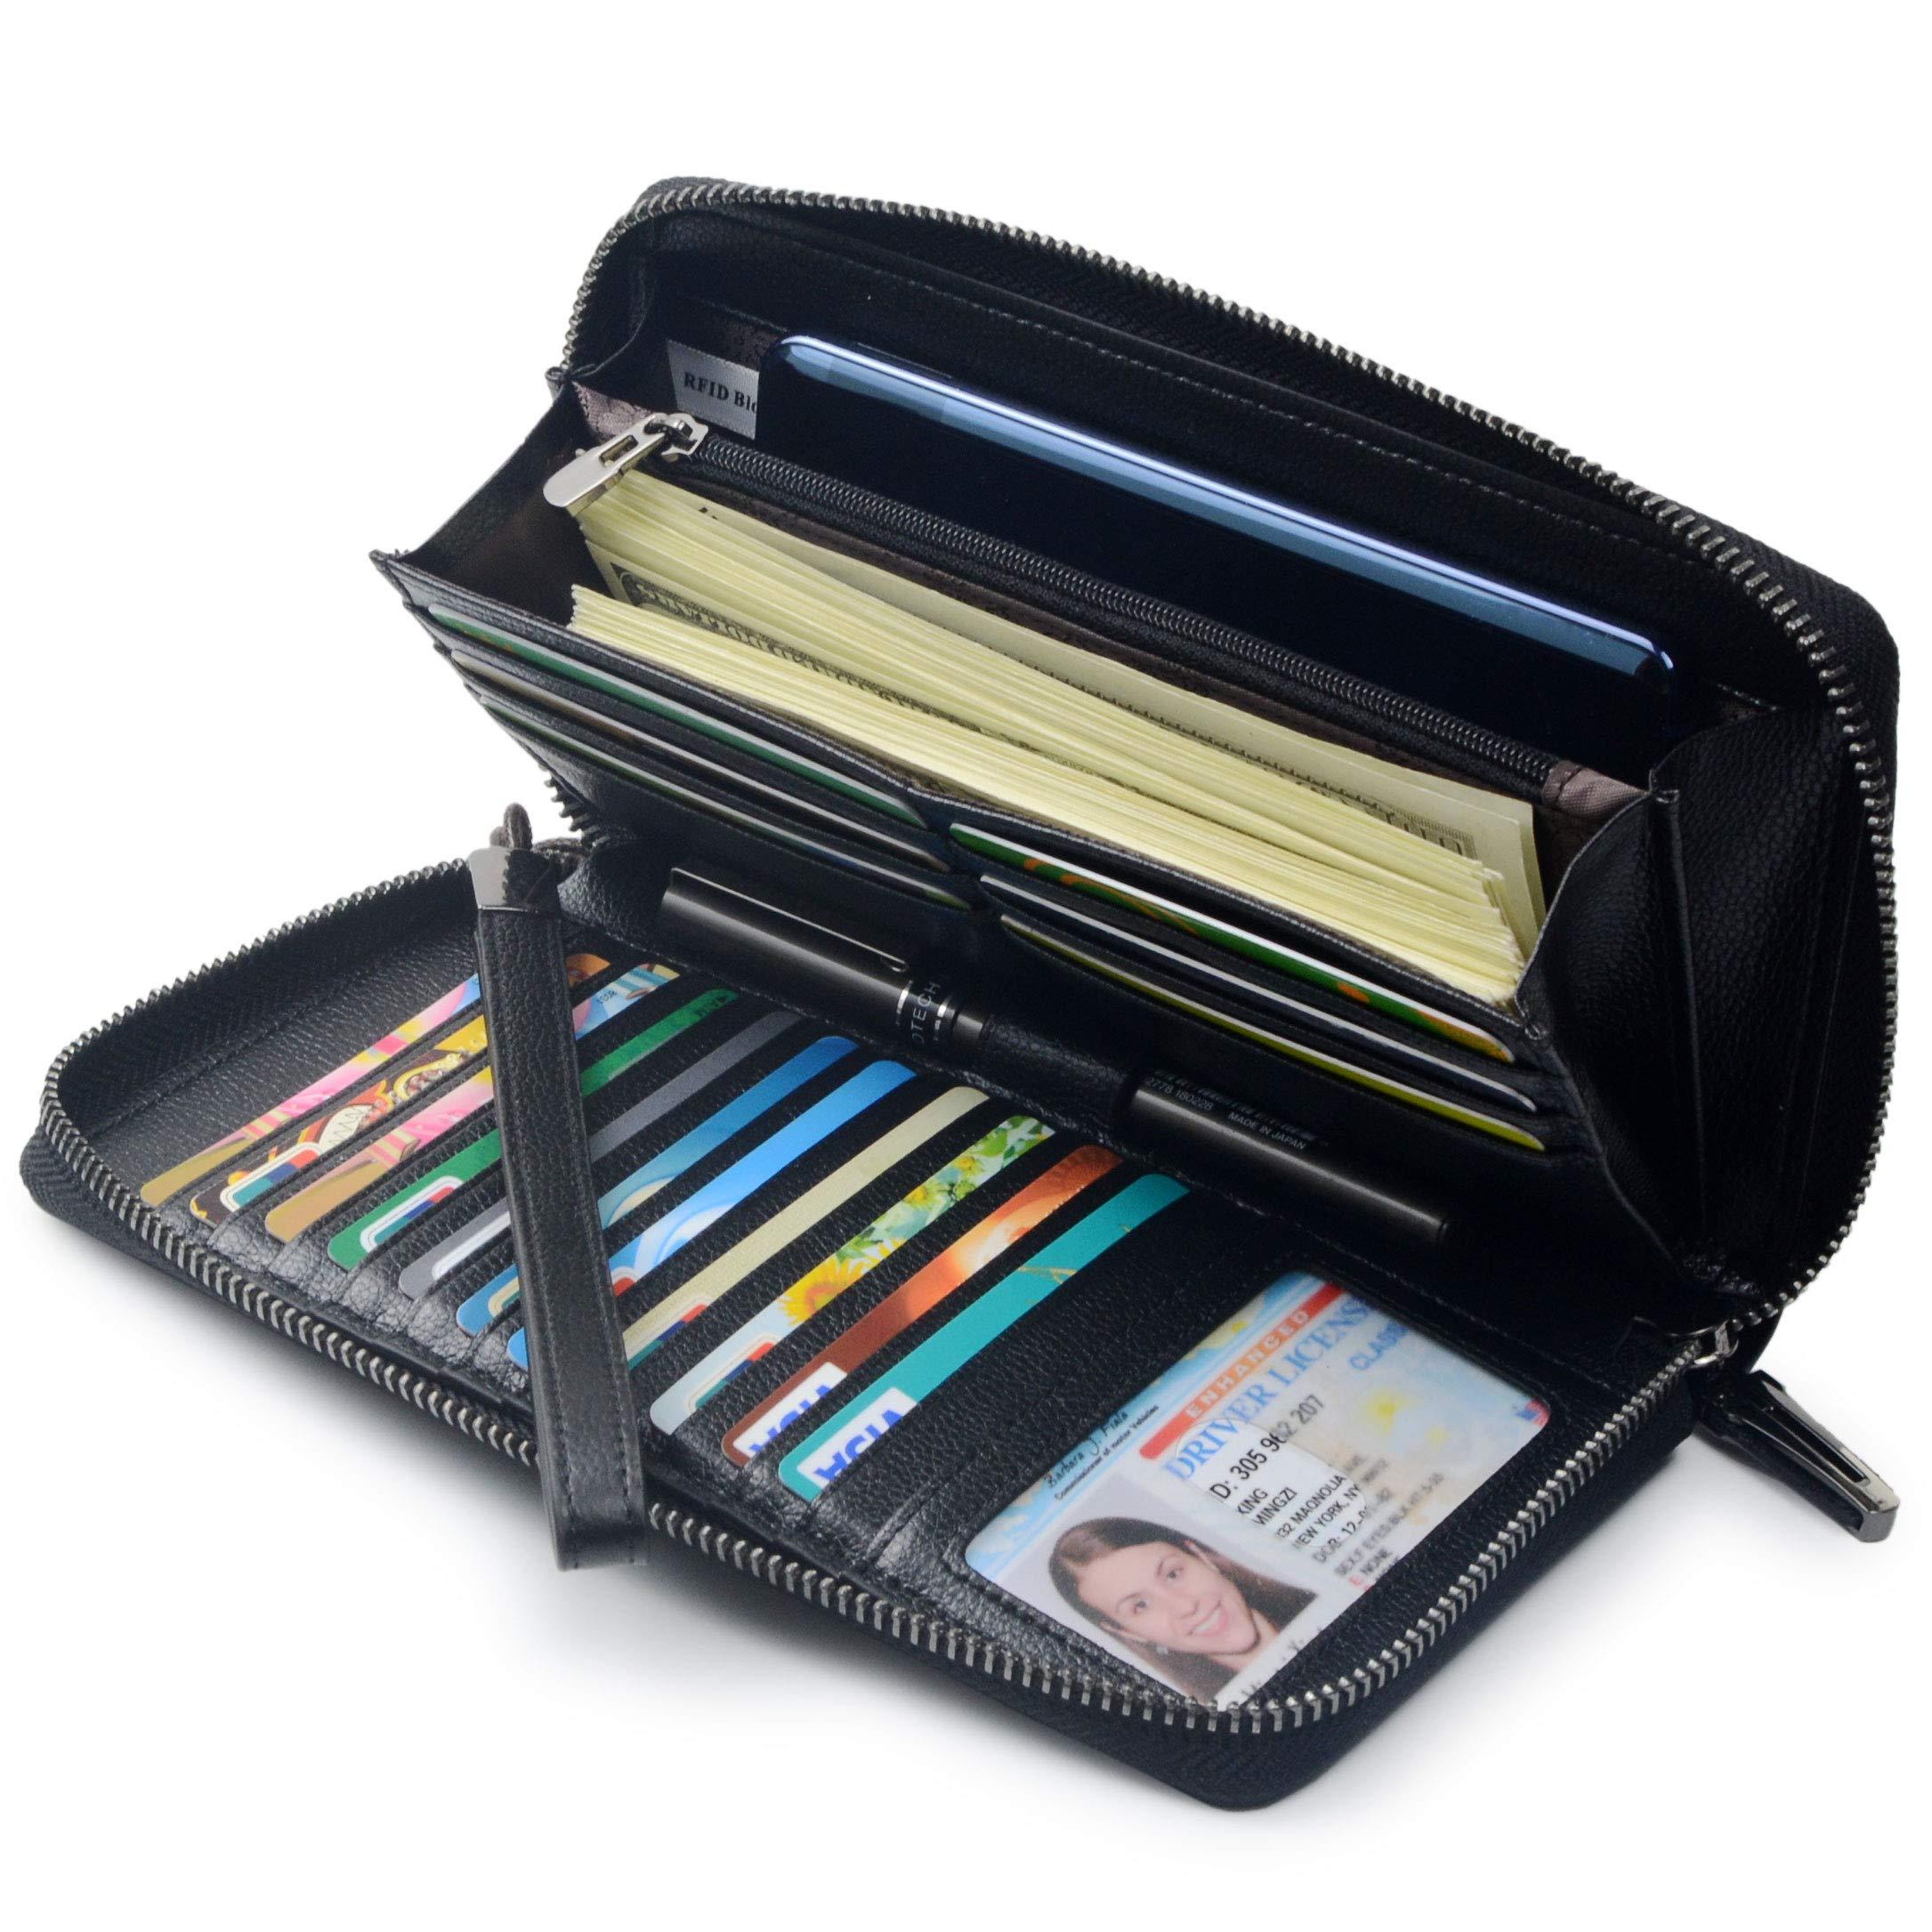 Women RFID Blocking Wallet Leather Zip Around Phone Clutch Large Travel Purse Wristlet (Black) ... by Bveyzi